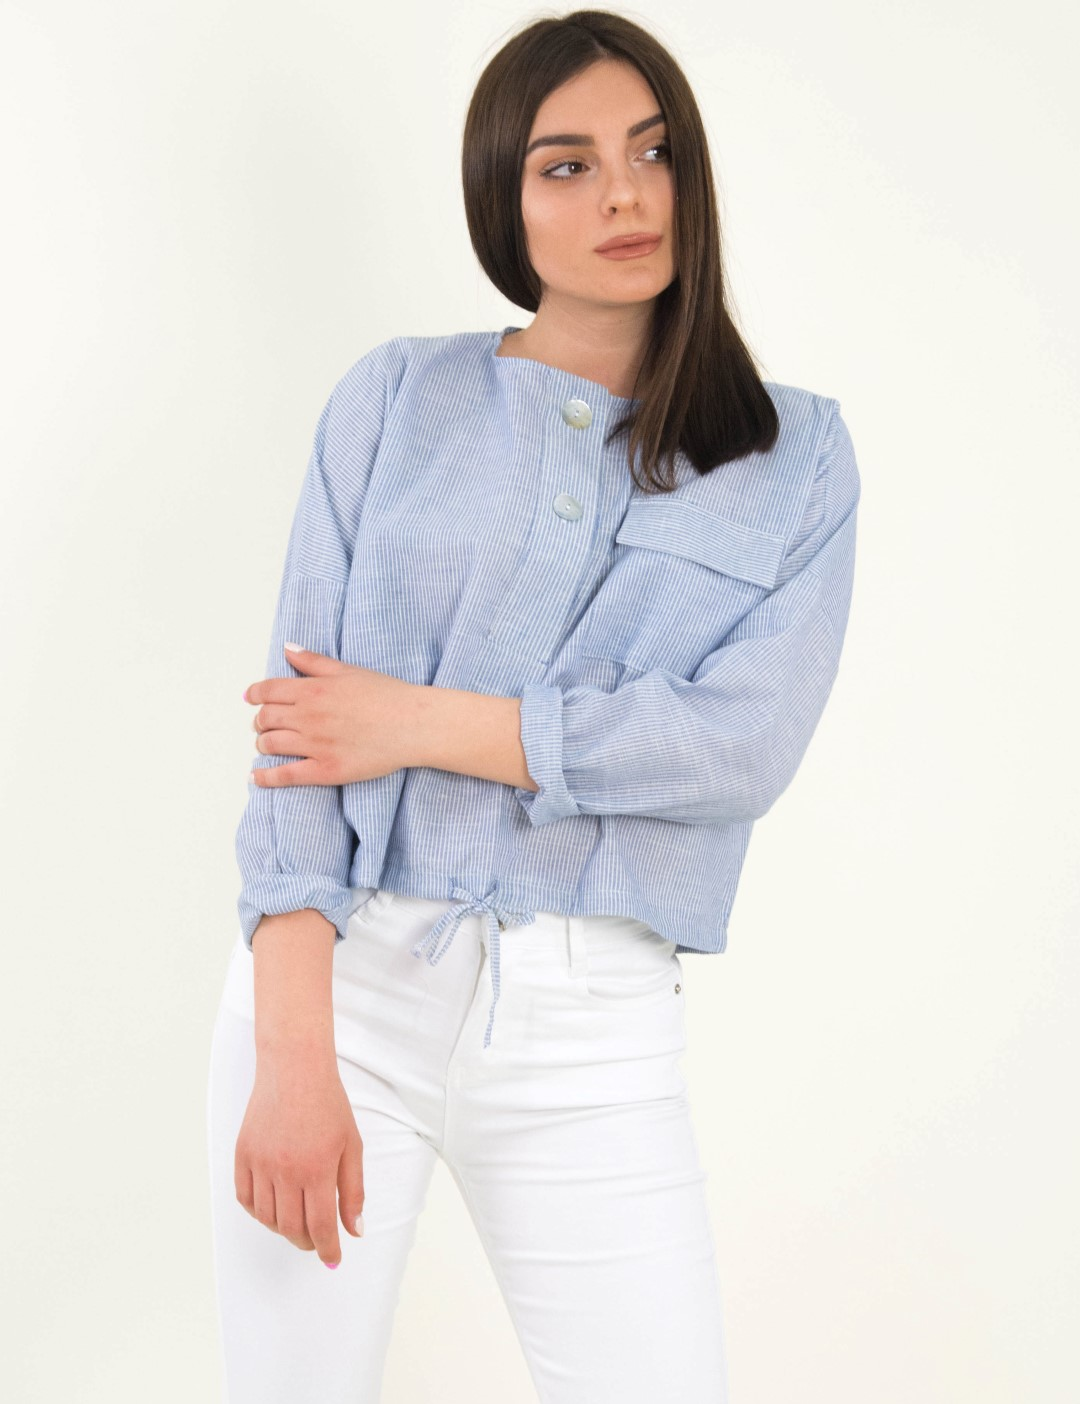 682f5a471d01 Γυναικείο σιέλ ριγέ Crop πουκάμισο με κορδόνι 19110